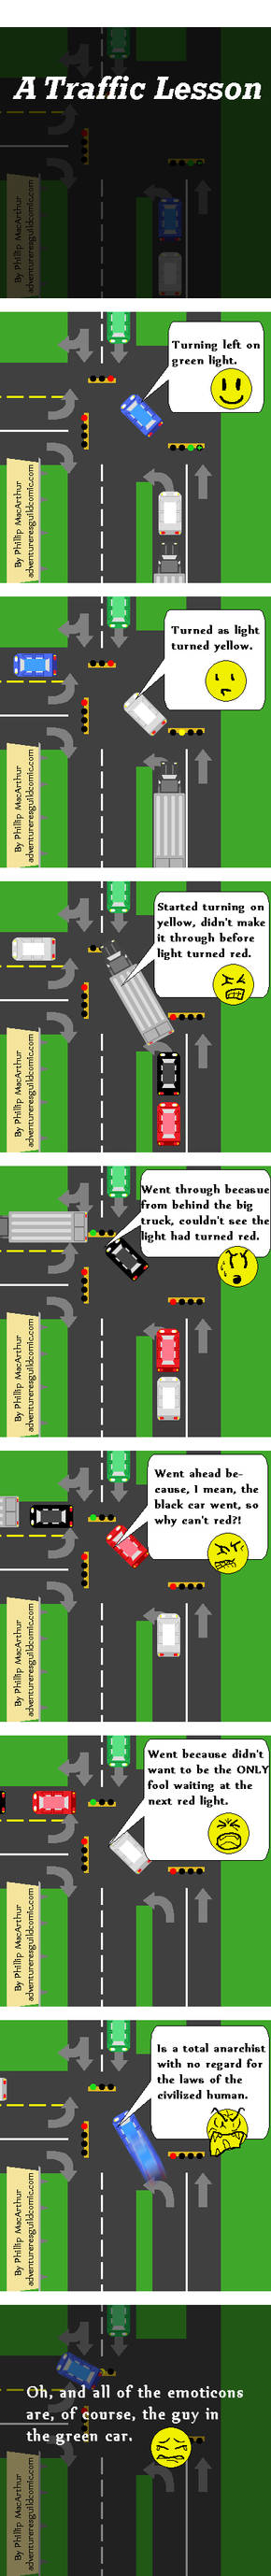 A Traffic Lesson